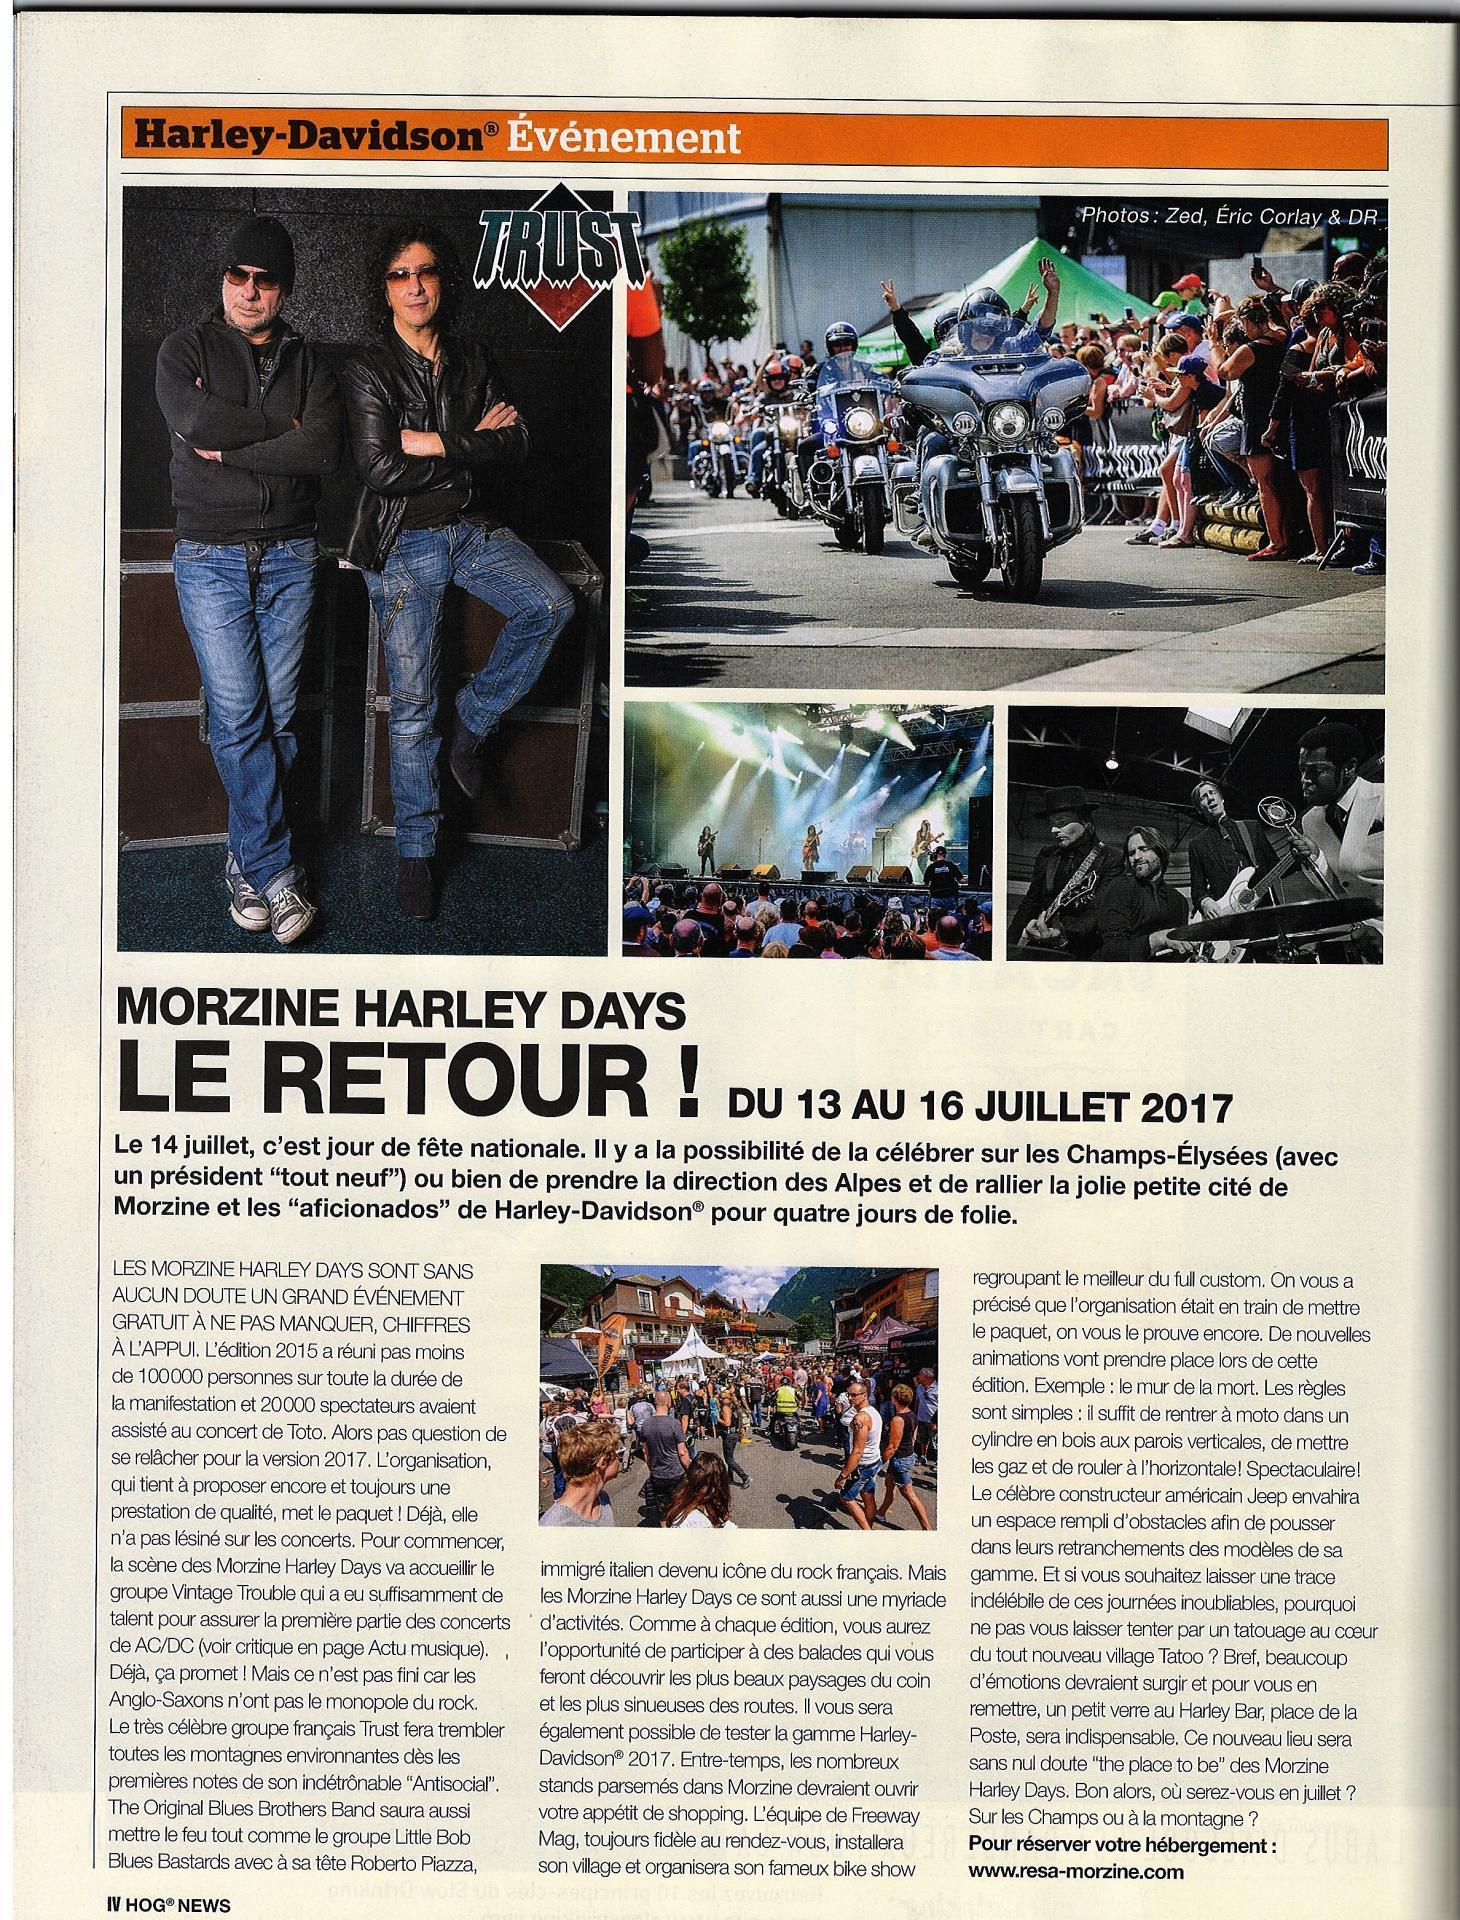 Morzine harley tour